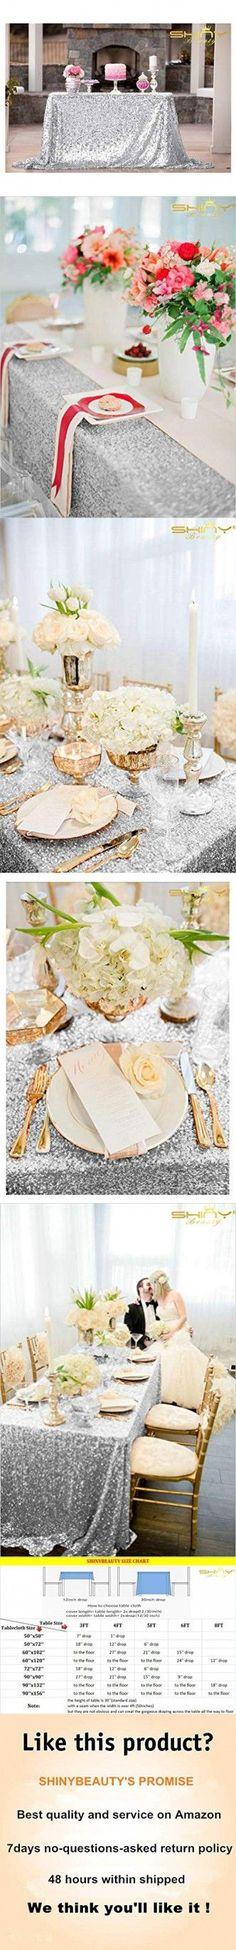 ShiDianYi 50''x72''Silver Sequin Tablecloth, Wedding Table Cloth, Sparkle Sequin Linens, Glitz, Sequin Cake Tablecloth, Sequin Tablecloth (50''x72'') - Wedding day ,  #50x72 #50x72Silver #Cake #cloth #DAY #Glitz #Linens #Sequin #ShiDianYi #Sparkle #Table #Tablecloth #Wedding Sequin Curtains, Sequin Backdrop, Sequin Tablecloth, Sequin Cake, Silver Sequin Skirt, Navy Blue Table Runner, Wedding Table, Wedding Day, Christmas Backdrops